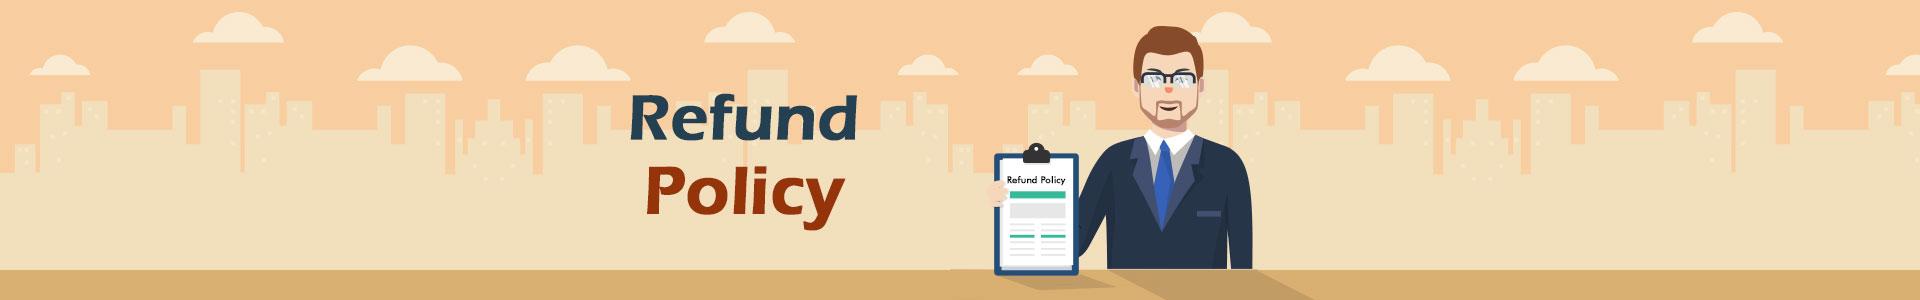 refund policy of GST